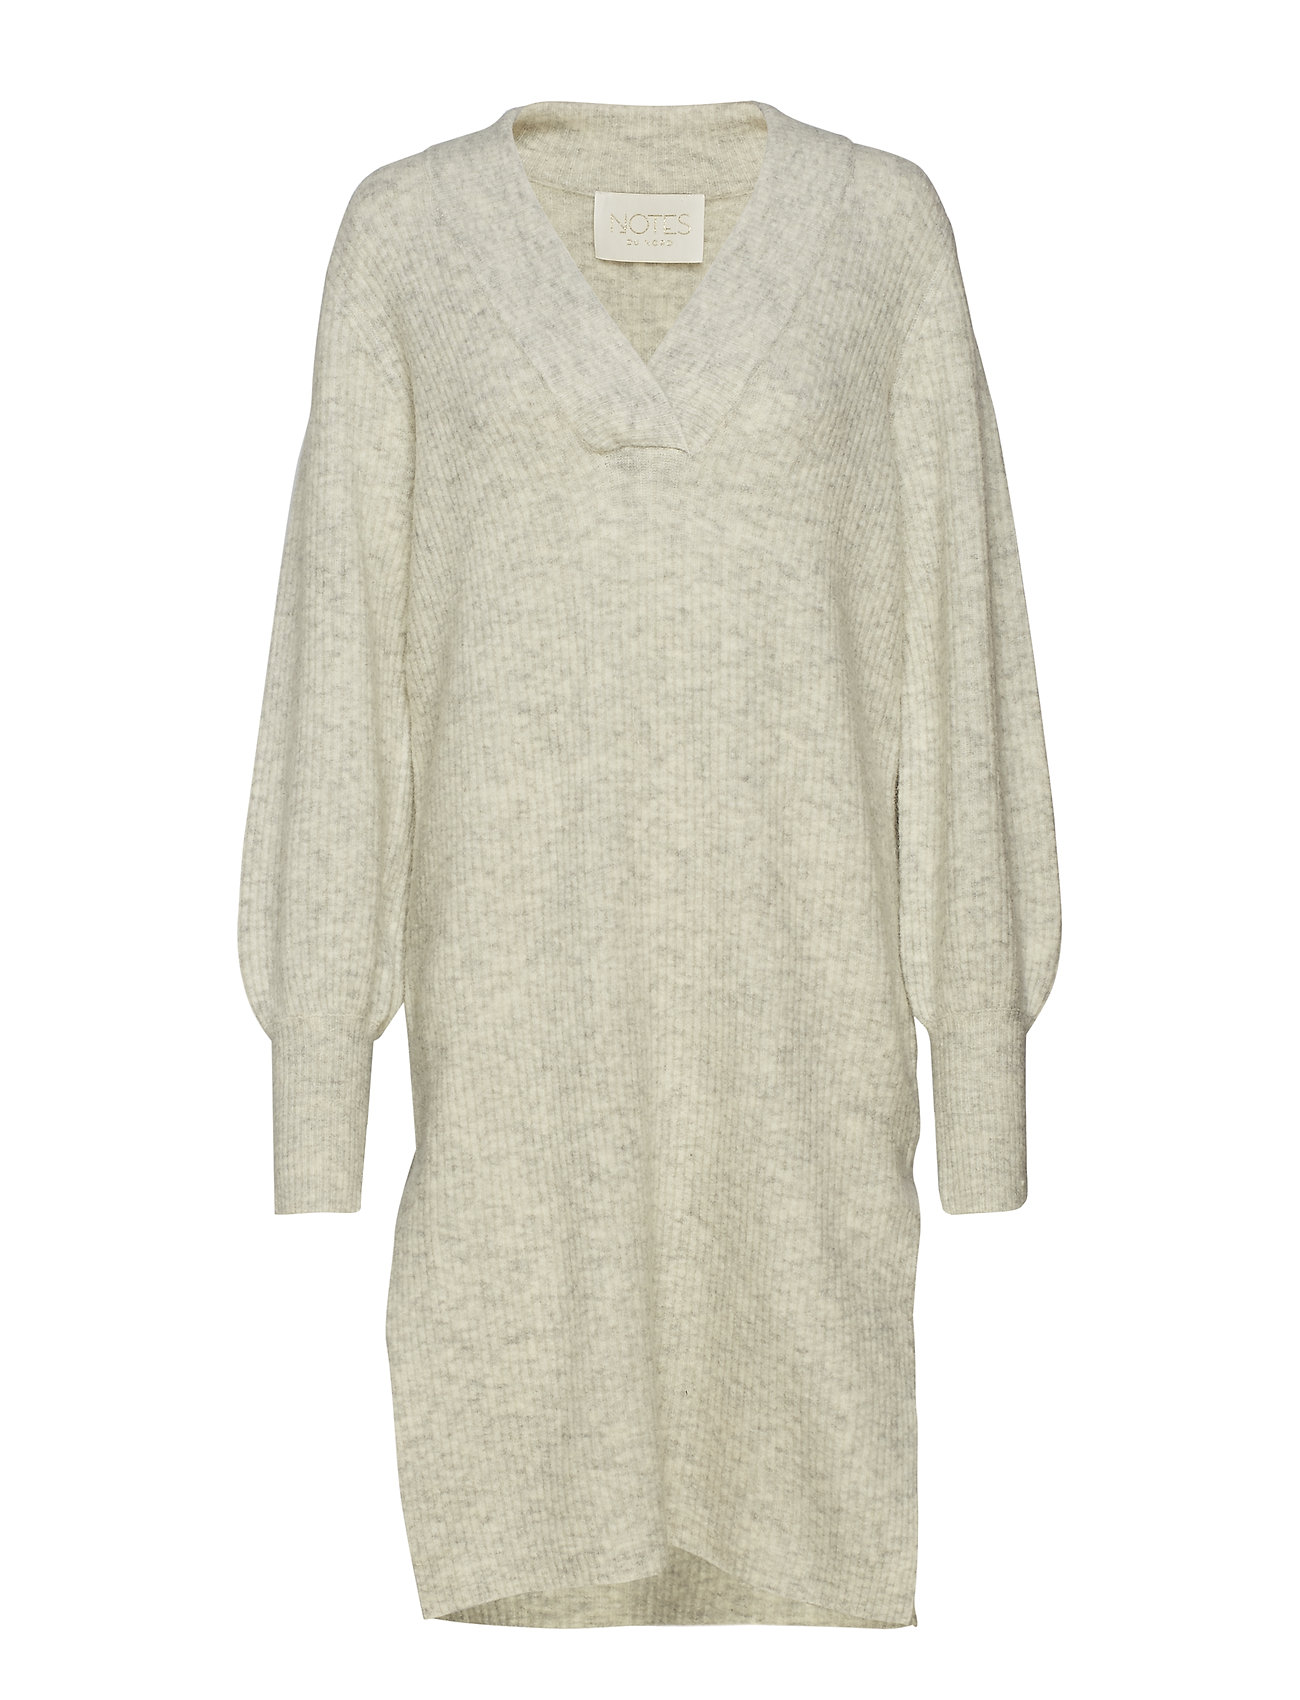 Notes du Nord Iris Dress - LIGHT GREY MELANGE